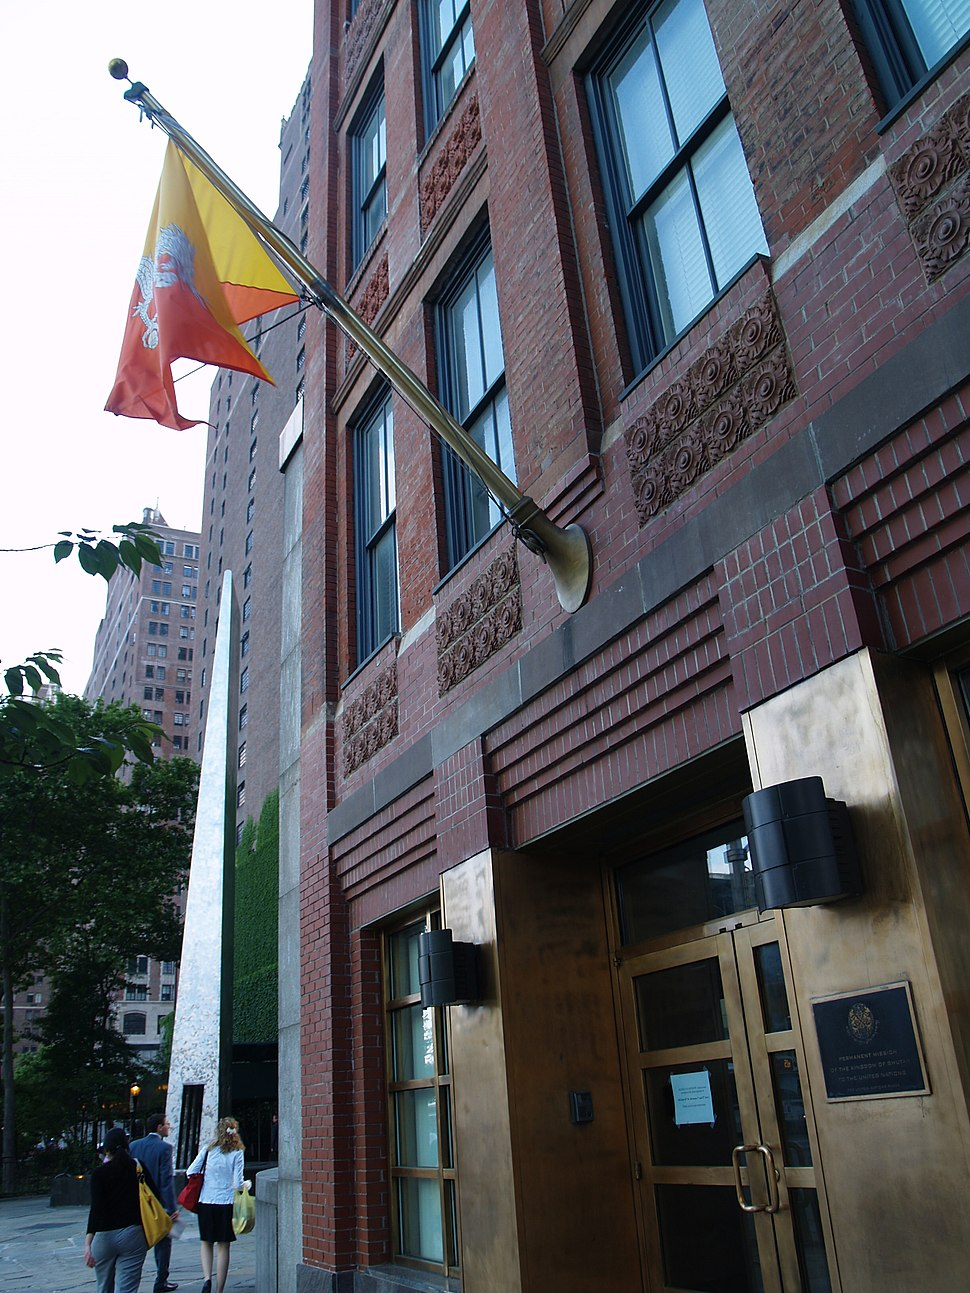 Bhutan Mission in New York